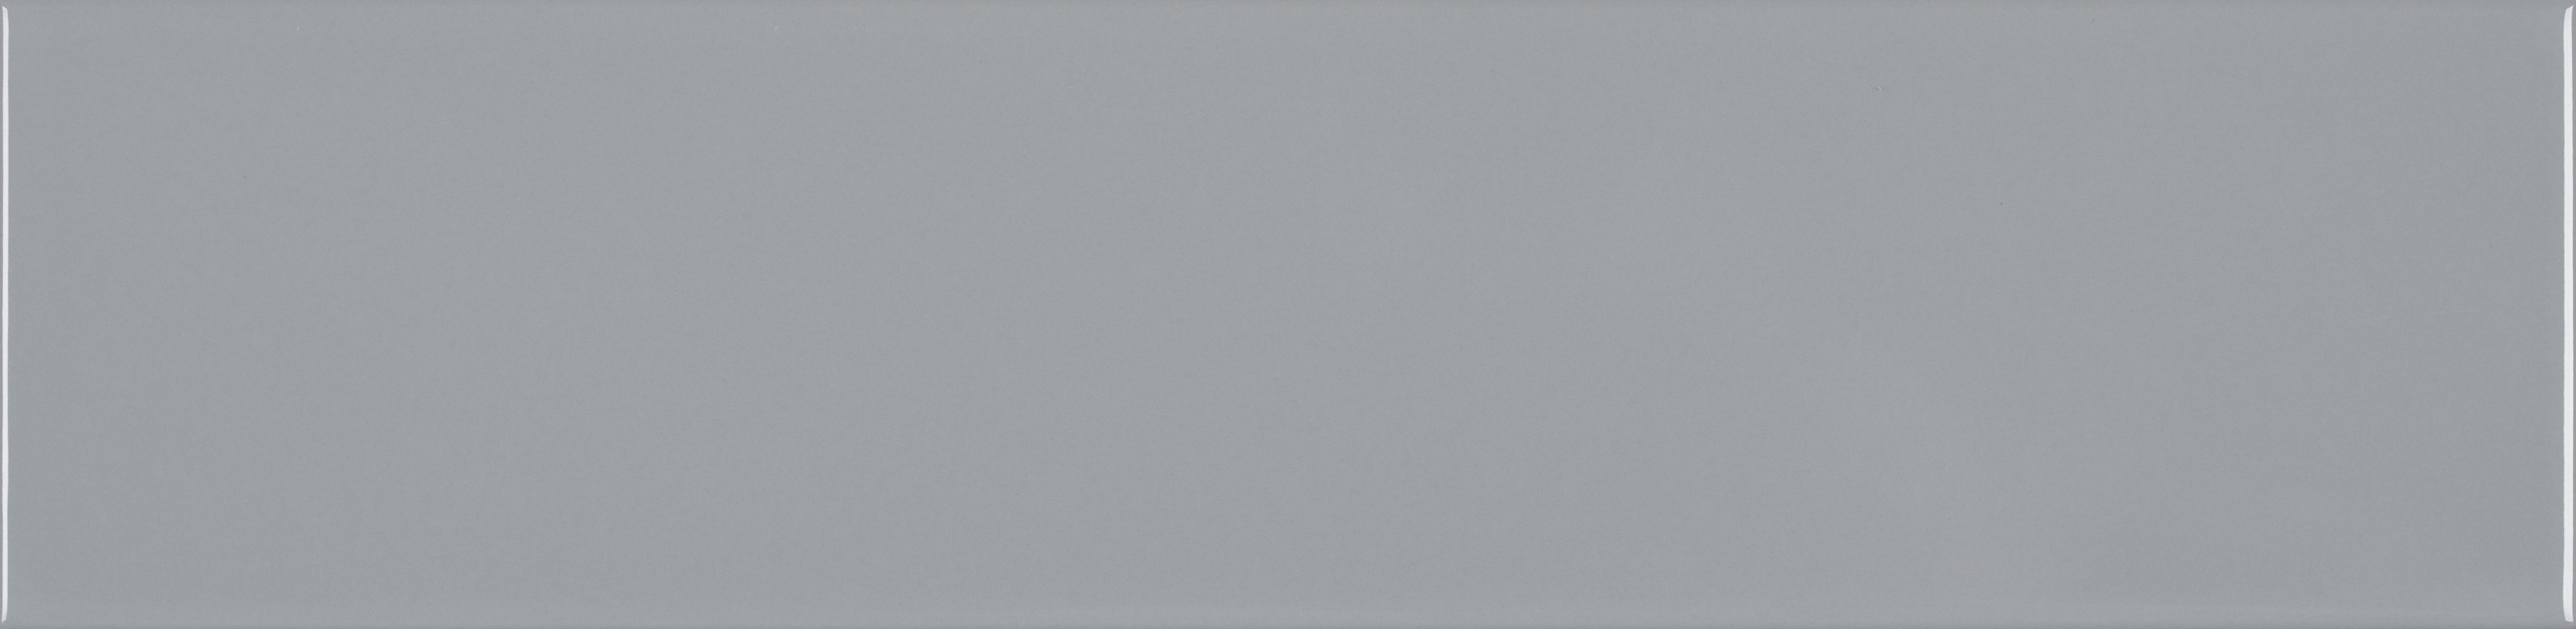 Krea Grey 4x16